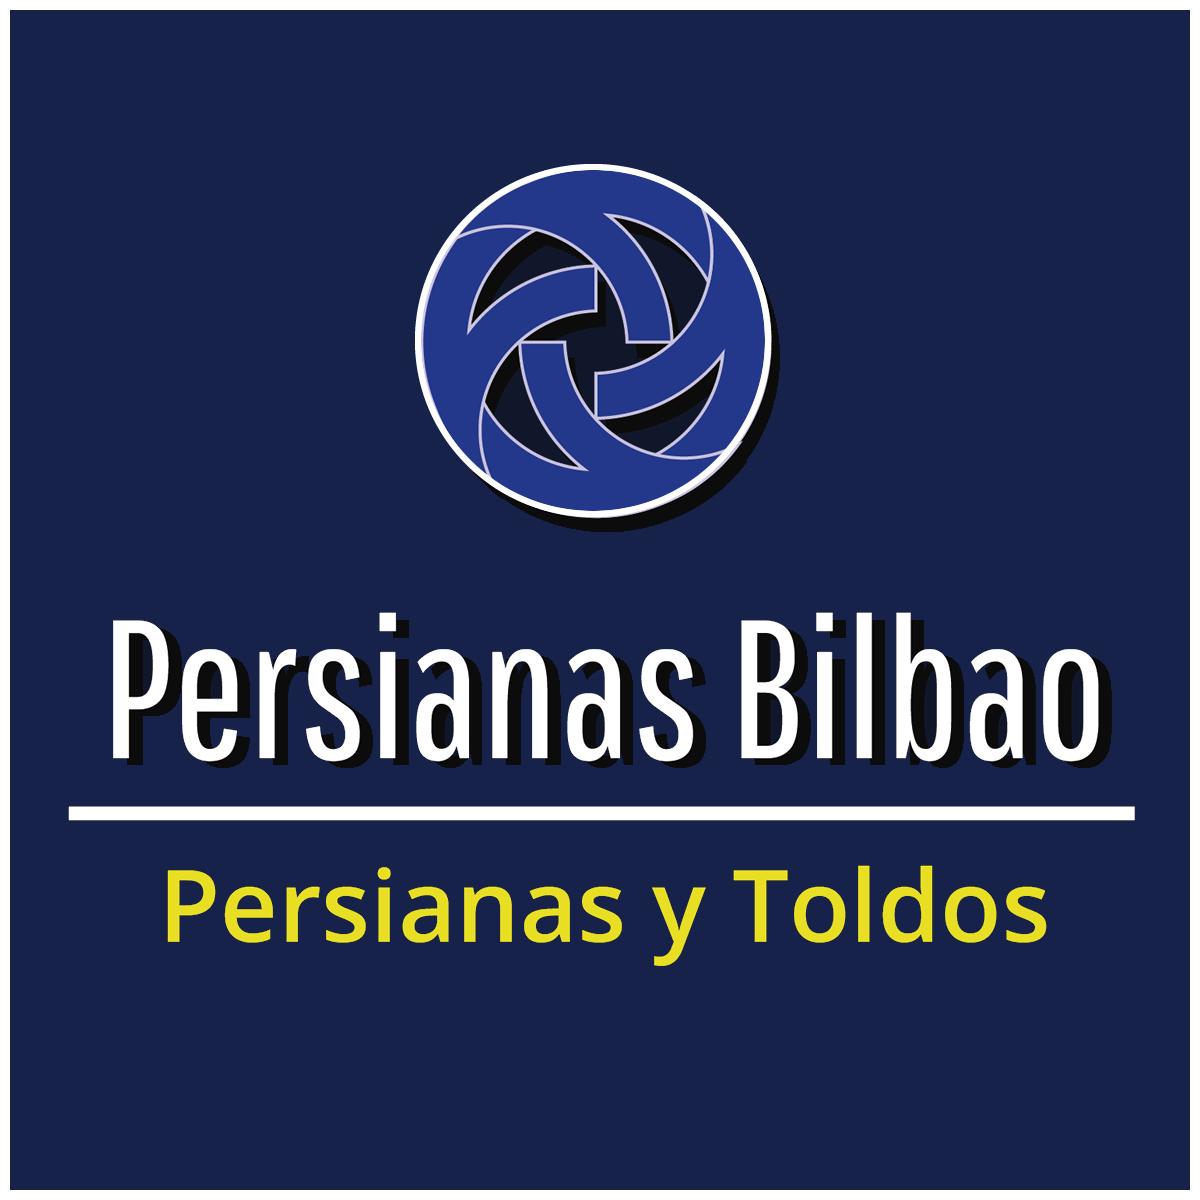 Persianas Bilbao